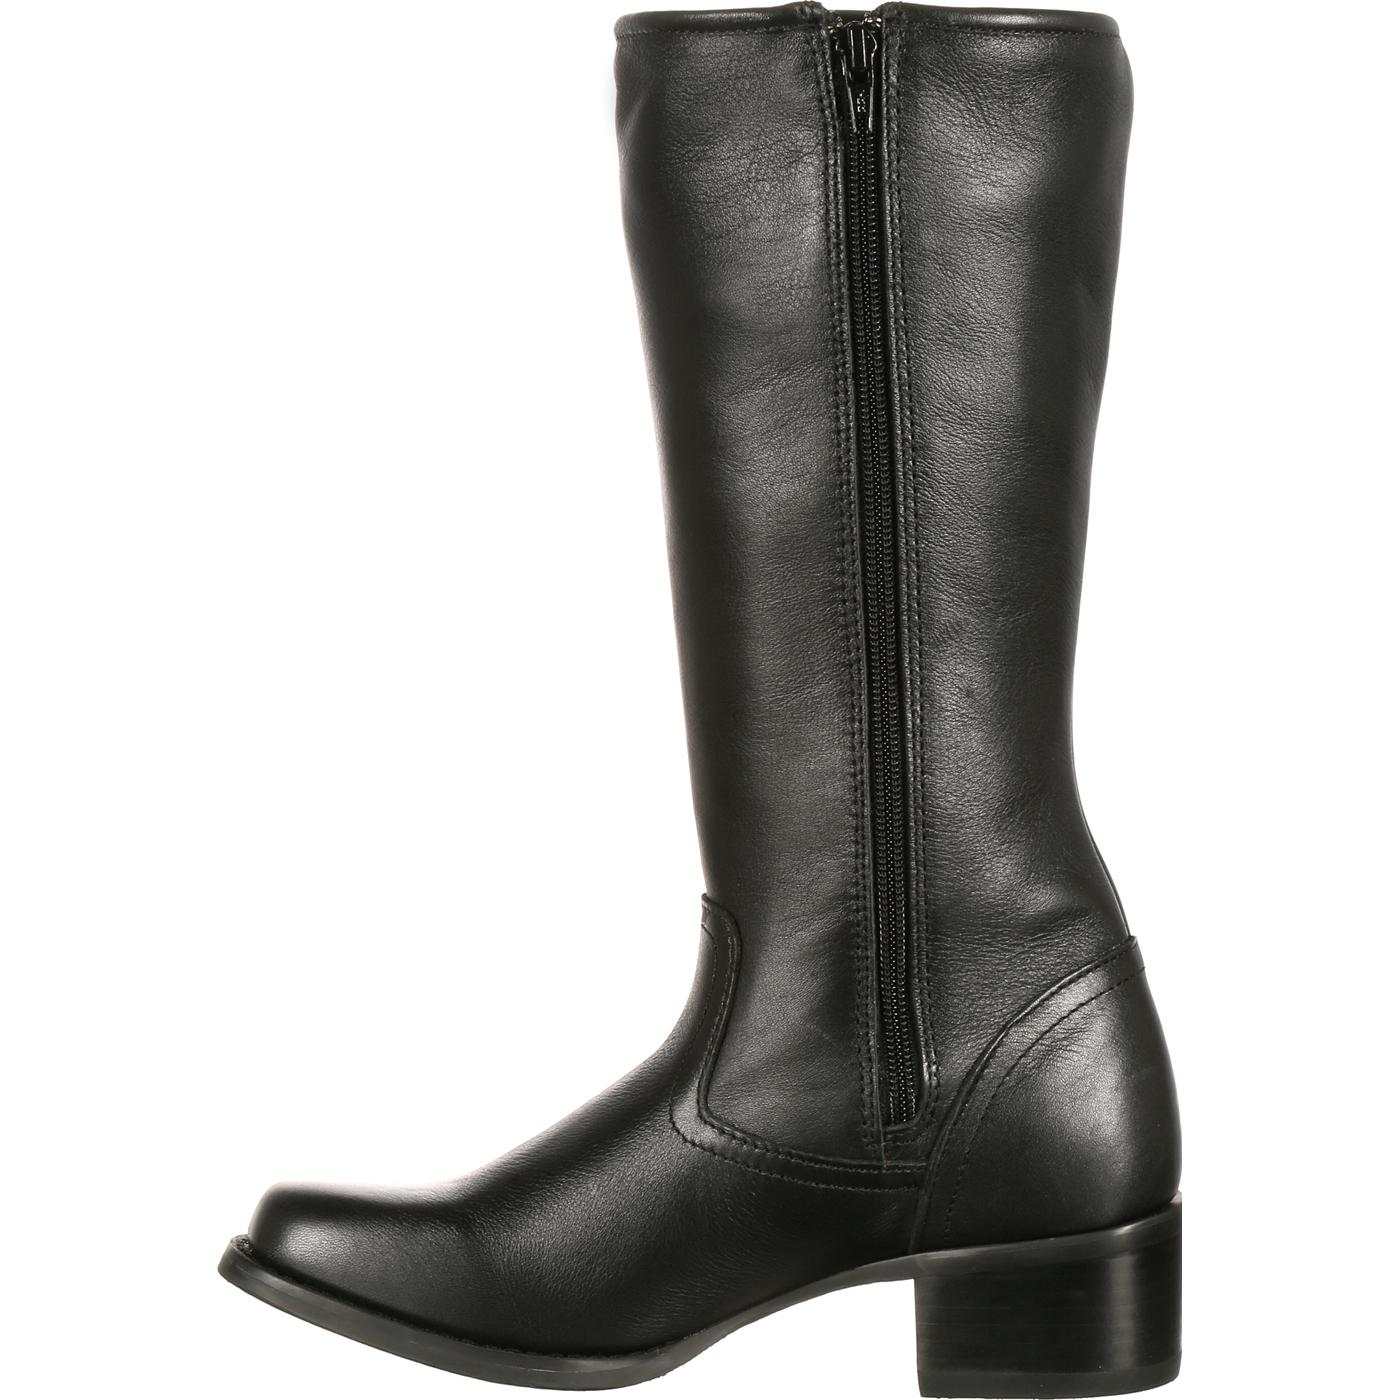 f4eb07697 Durango City: Women's Tall Black Leather Side Zip Boots